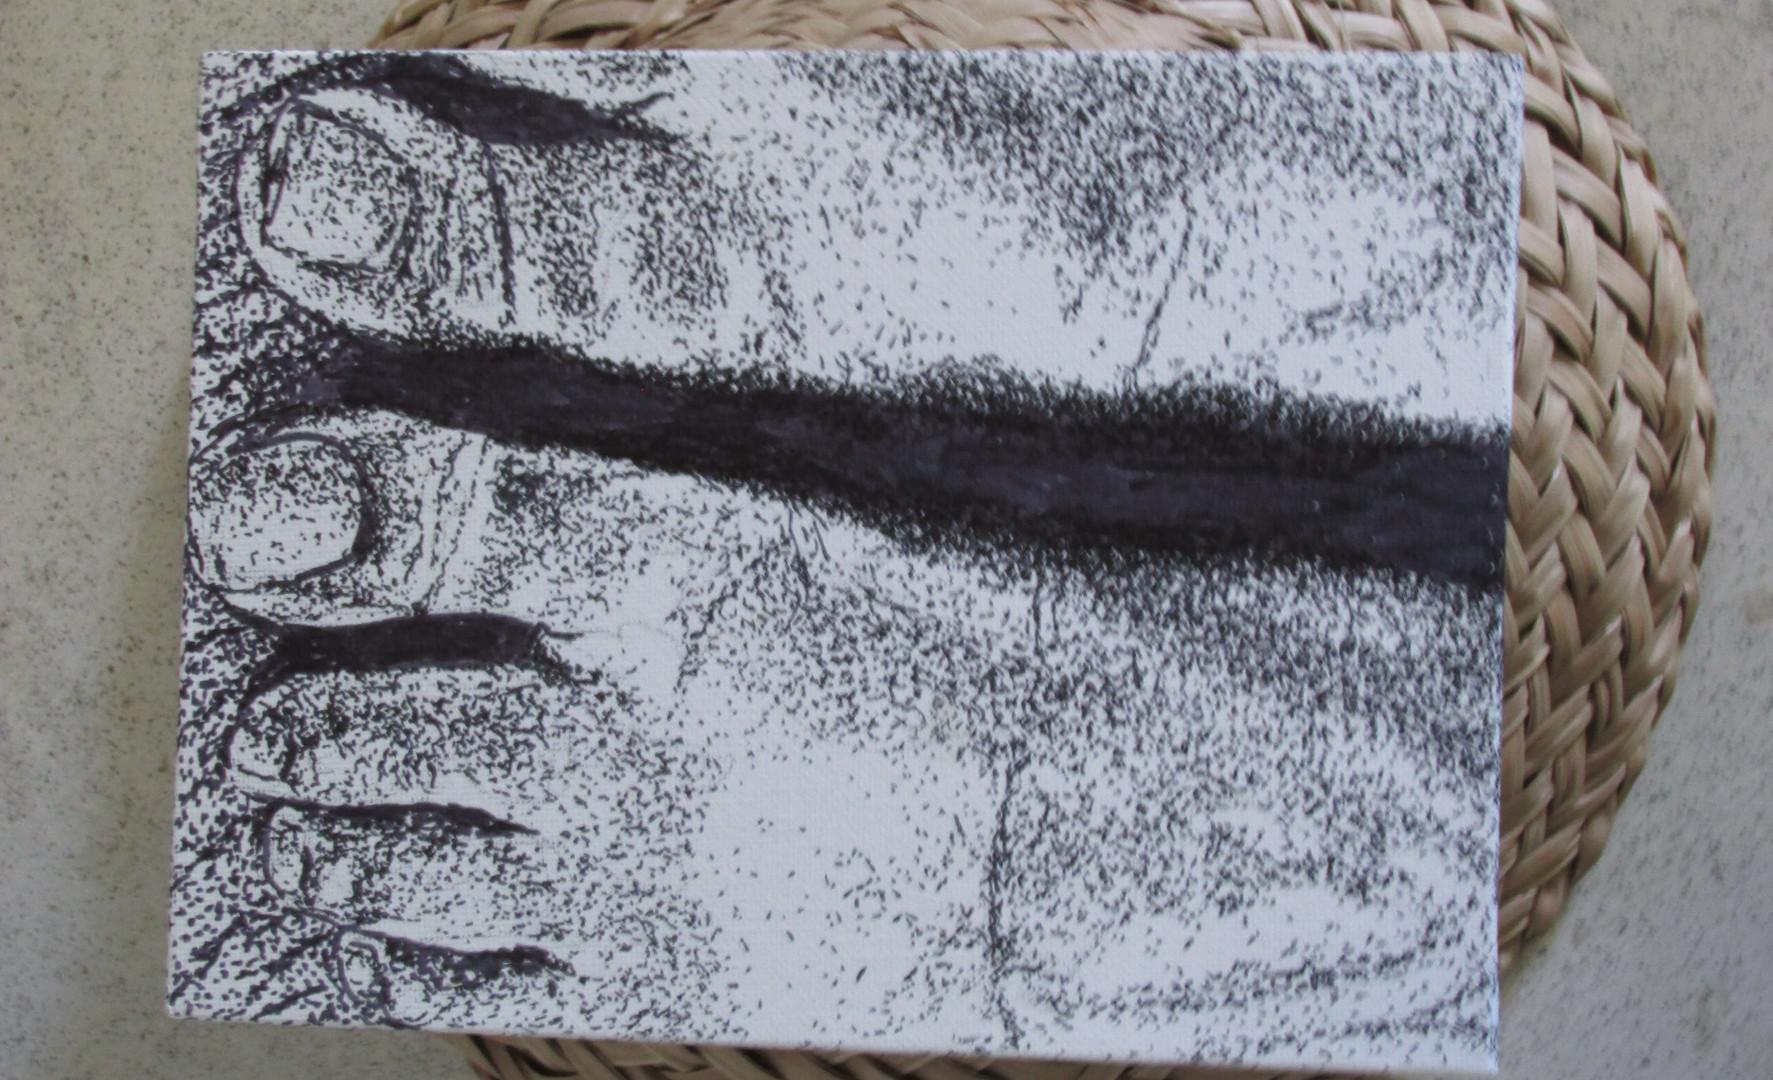 Makayla's Feet